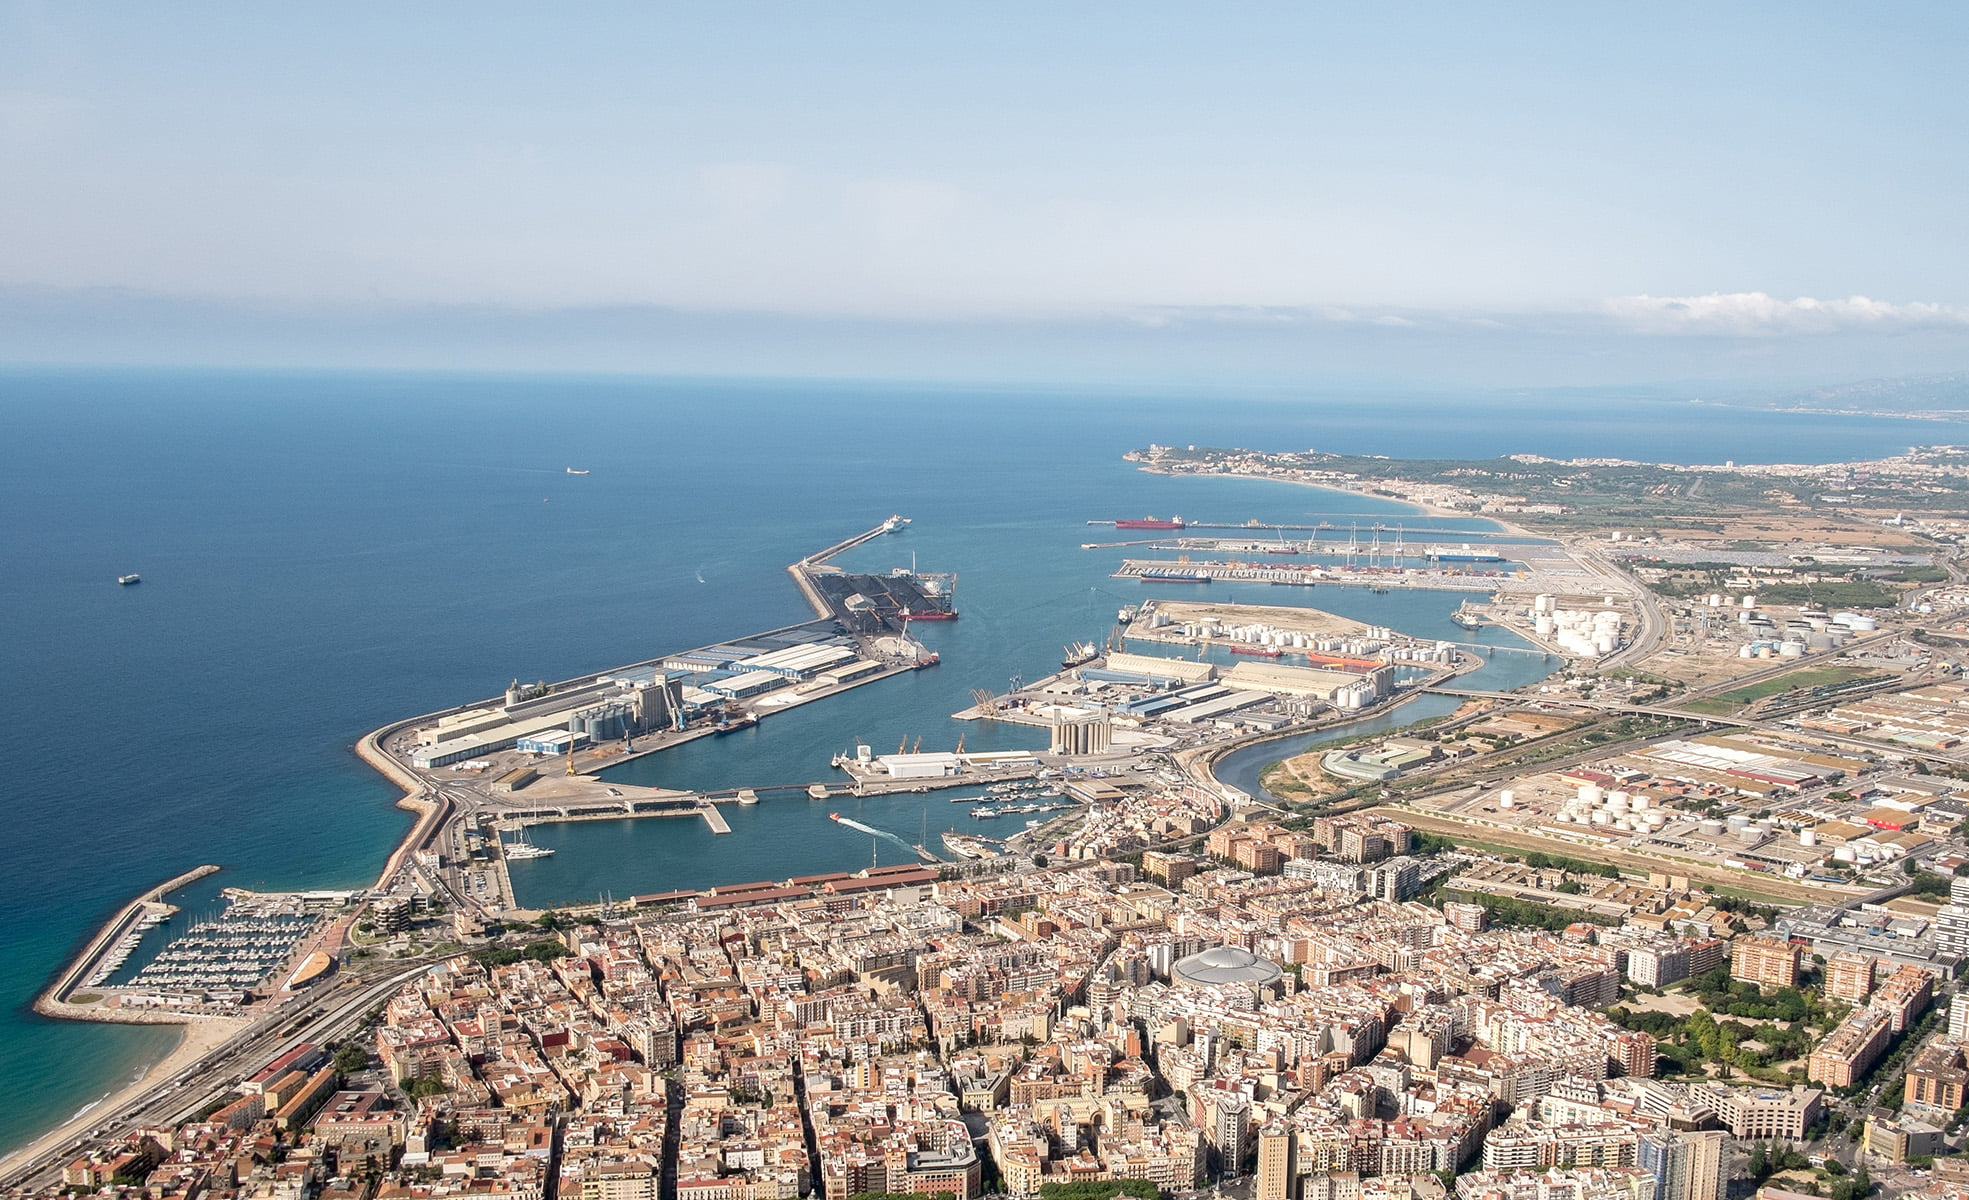 Tarragona vista aerea Fairwinds future for Shipyards on the Catalan Coast